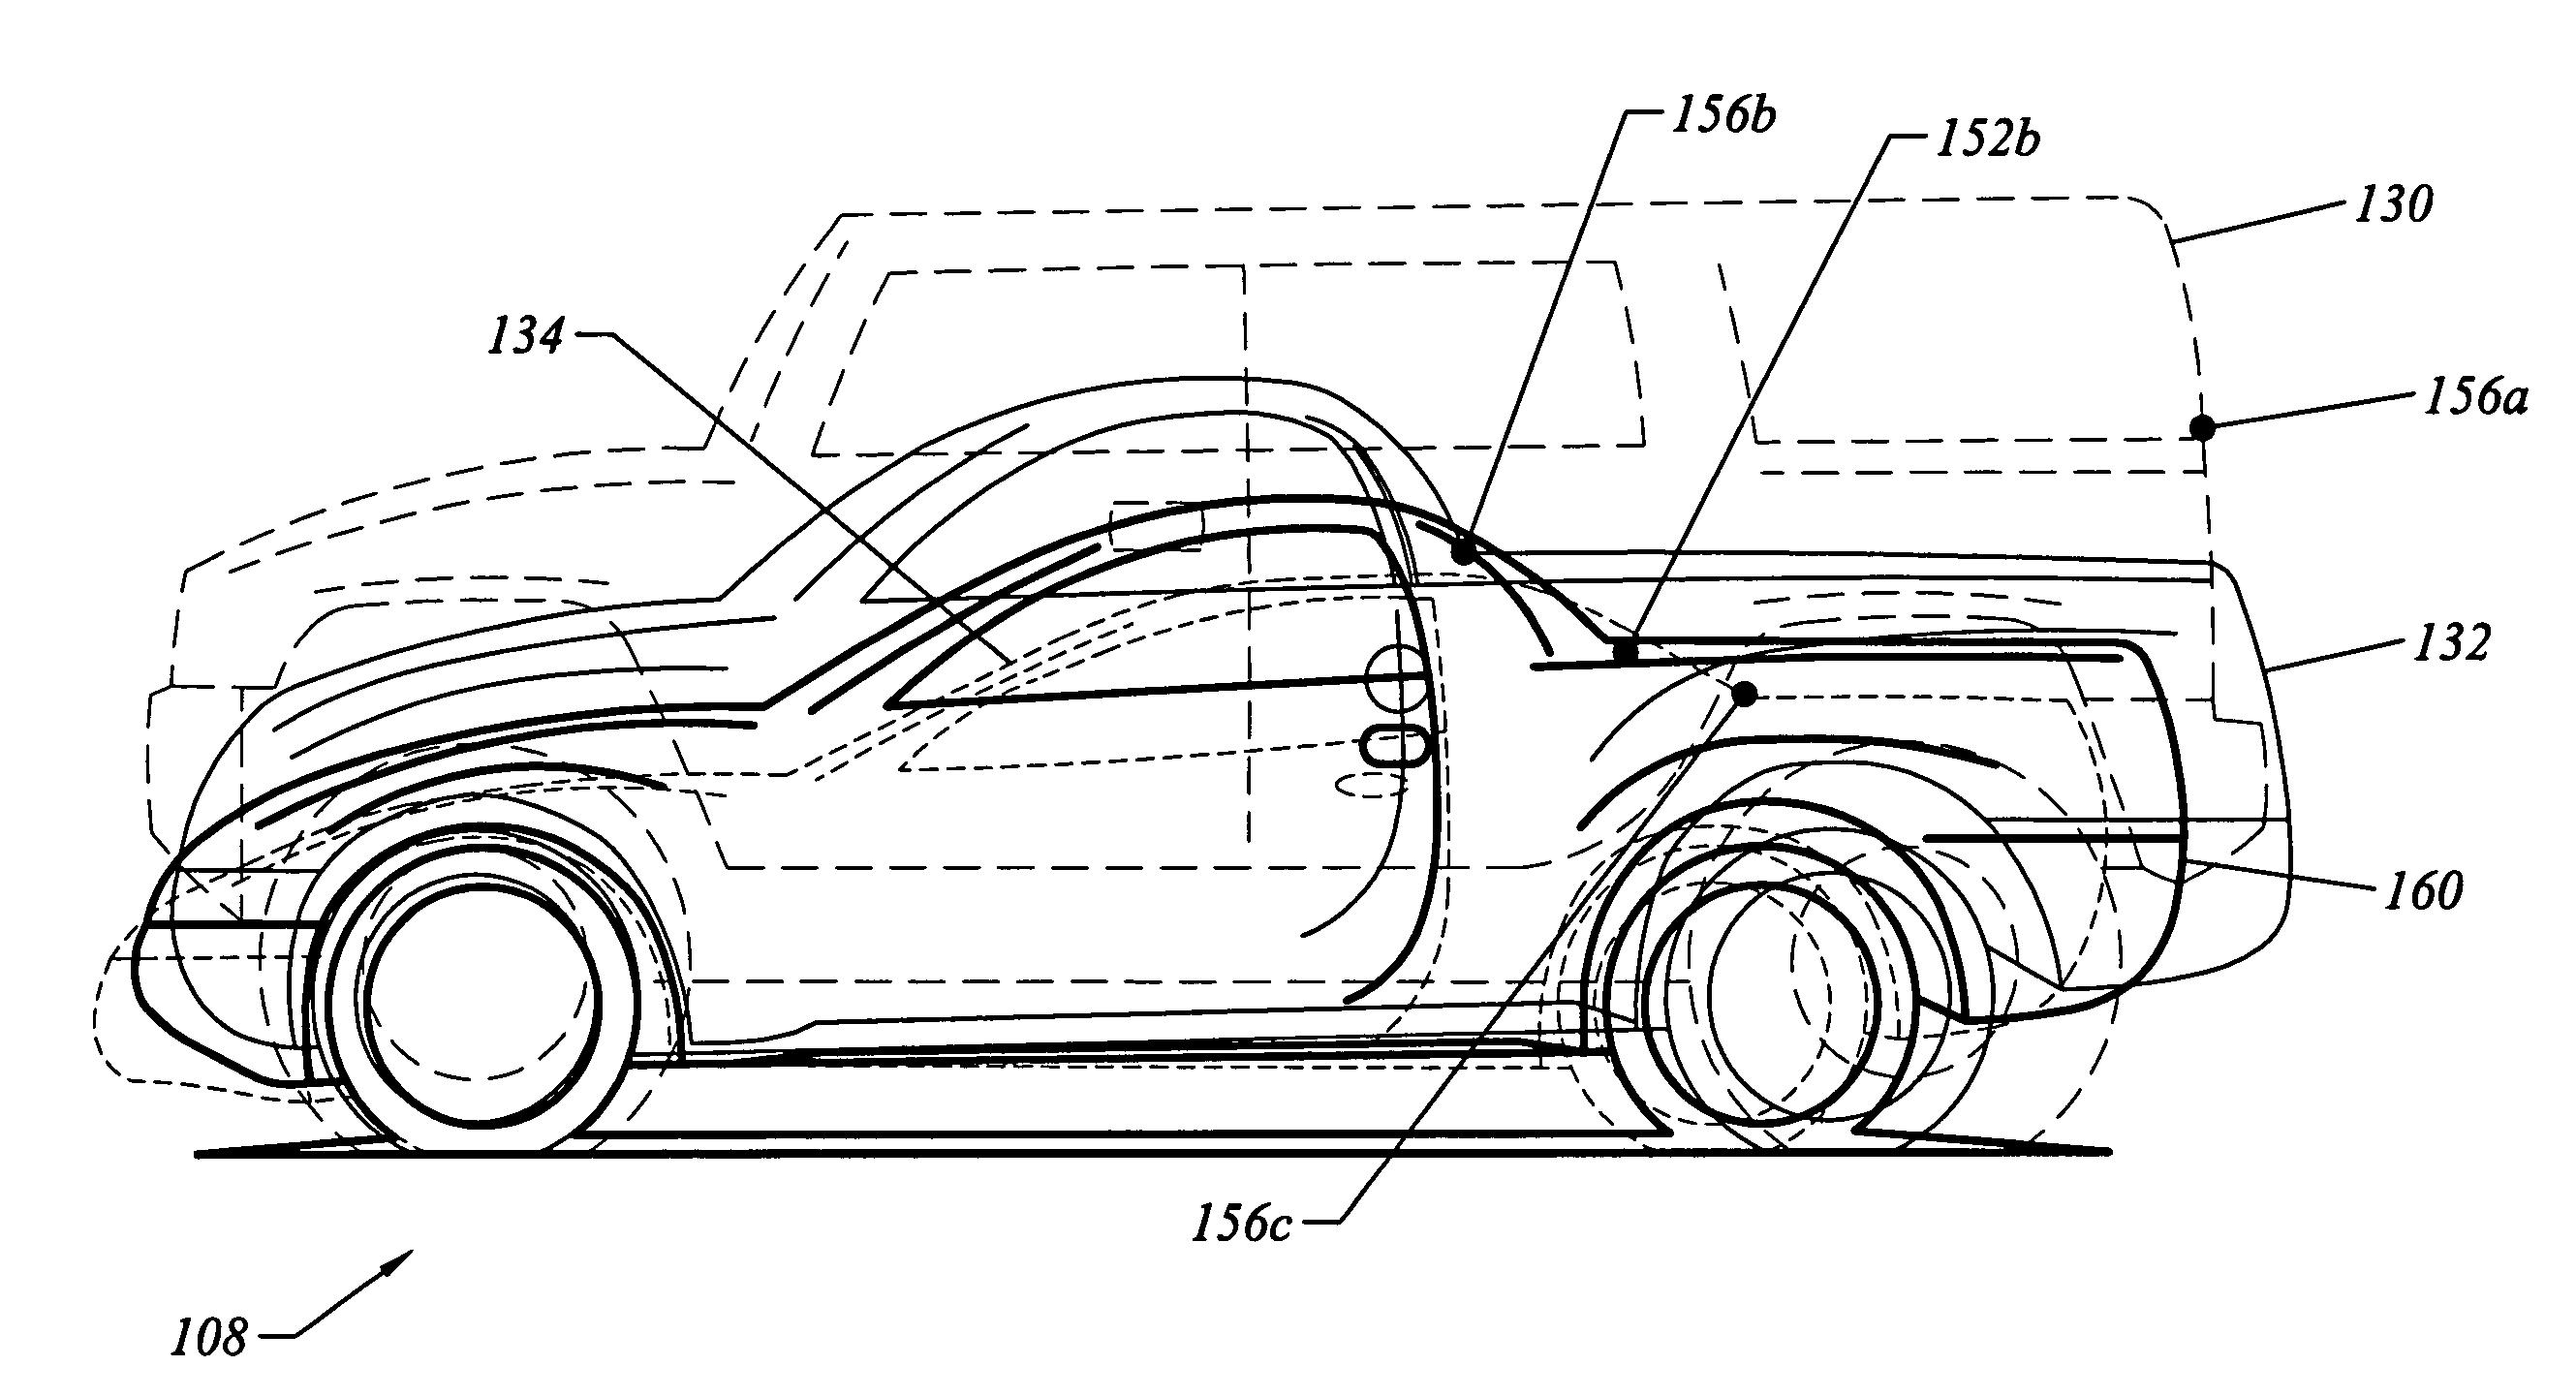 automotive engineering drawings 79903